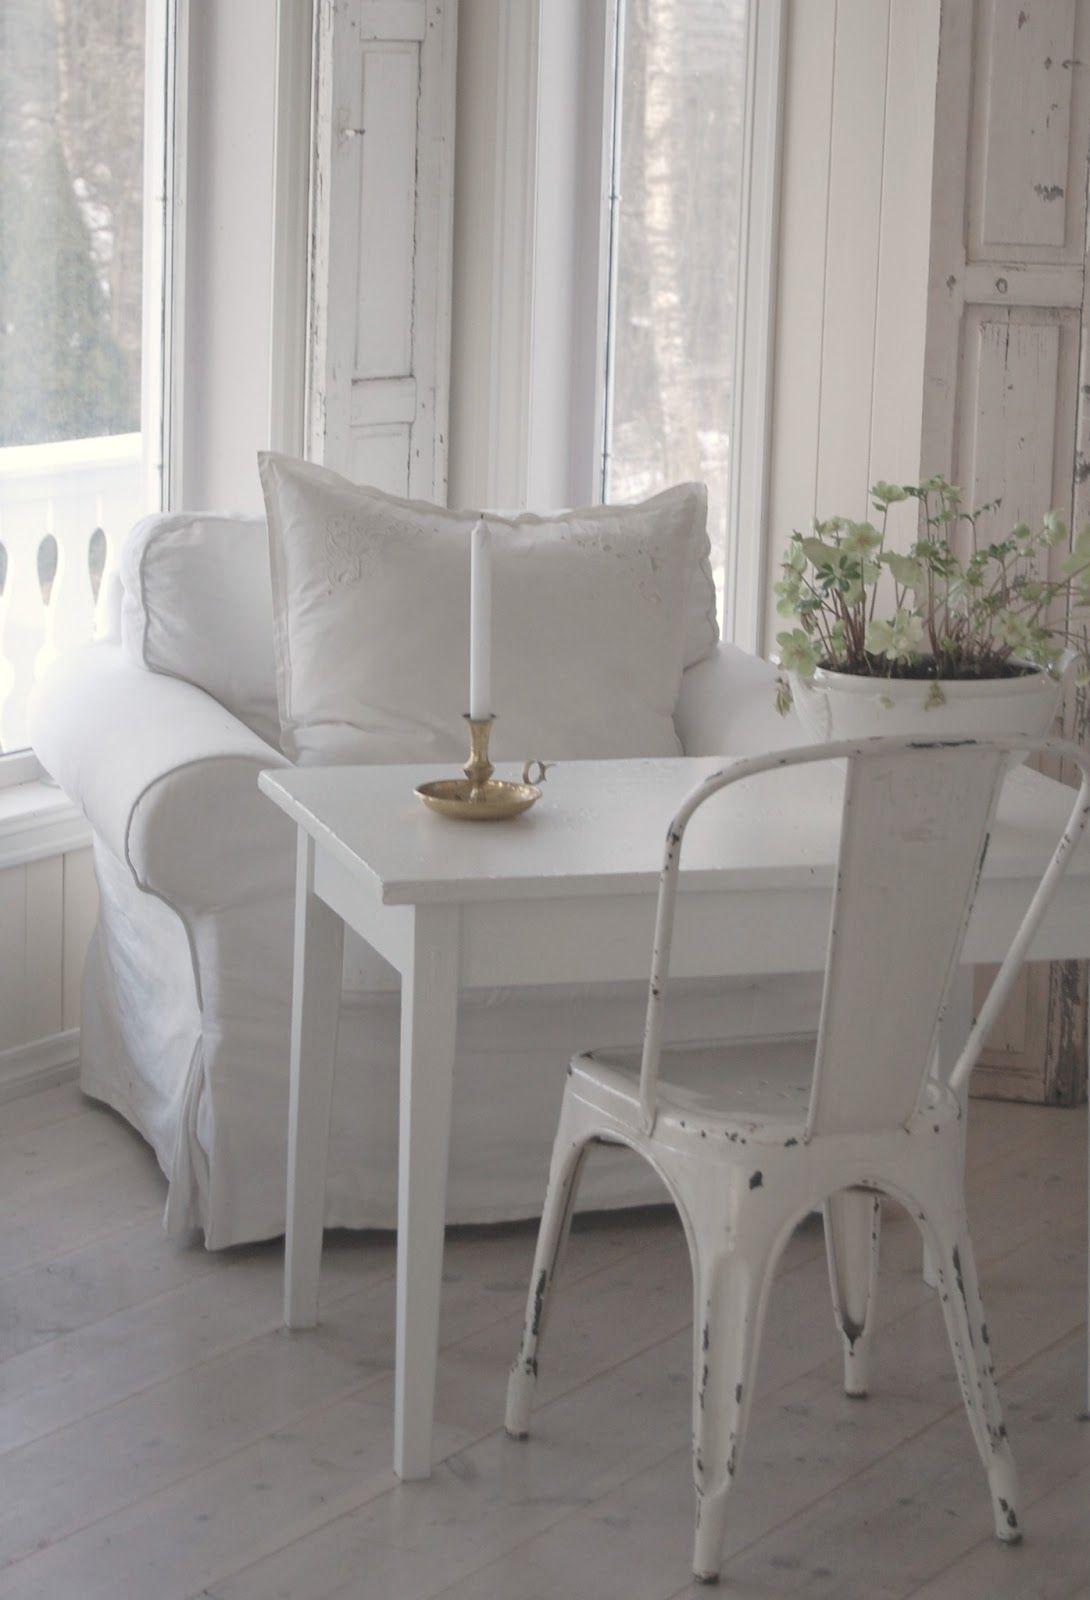 All white Scandinavian decor.... so peaceful.